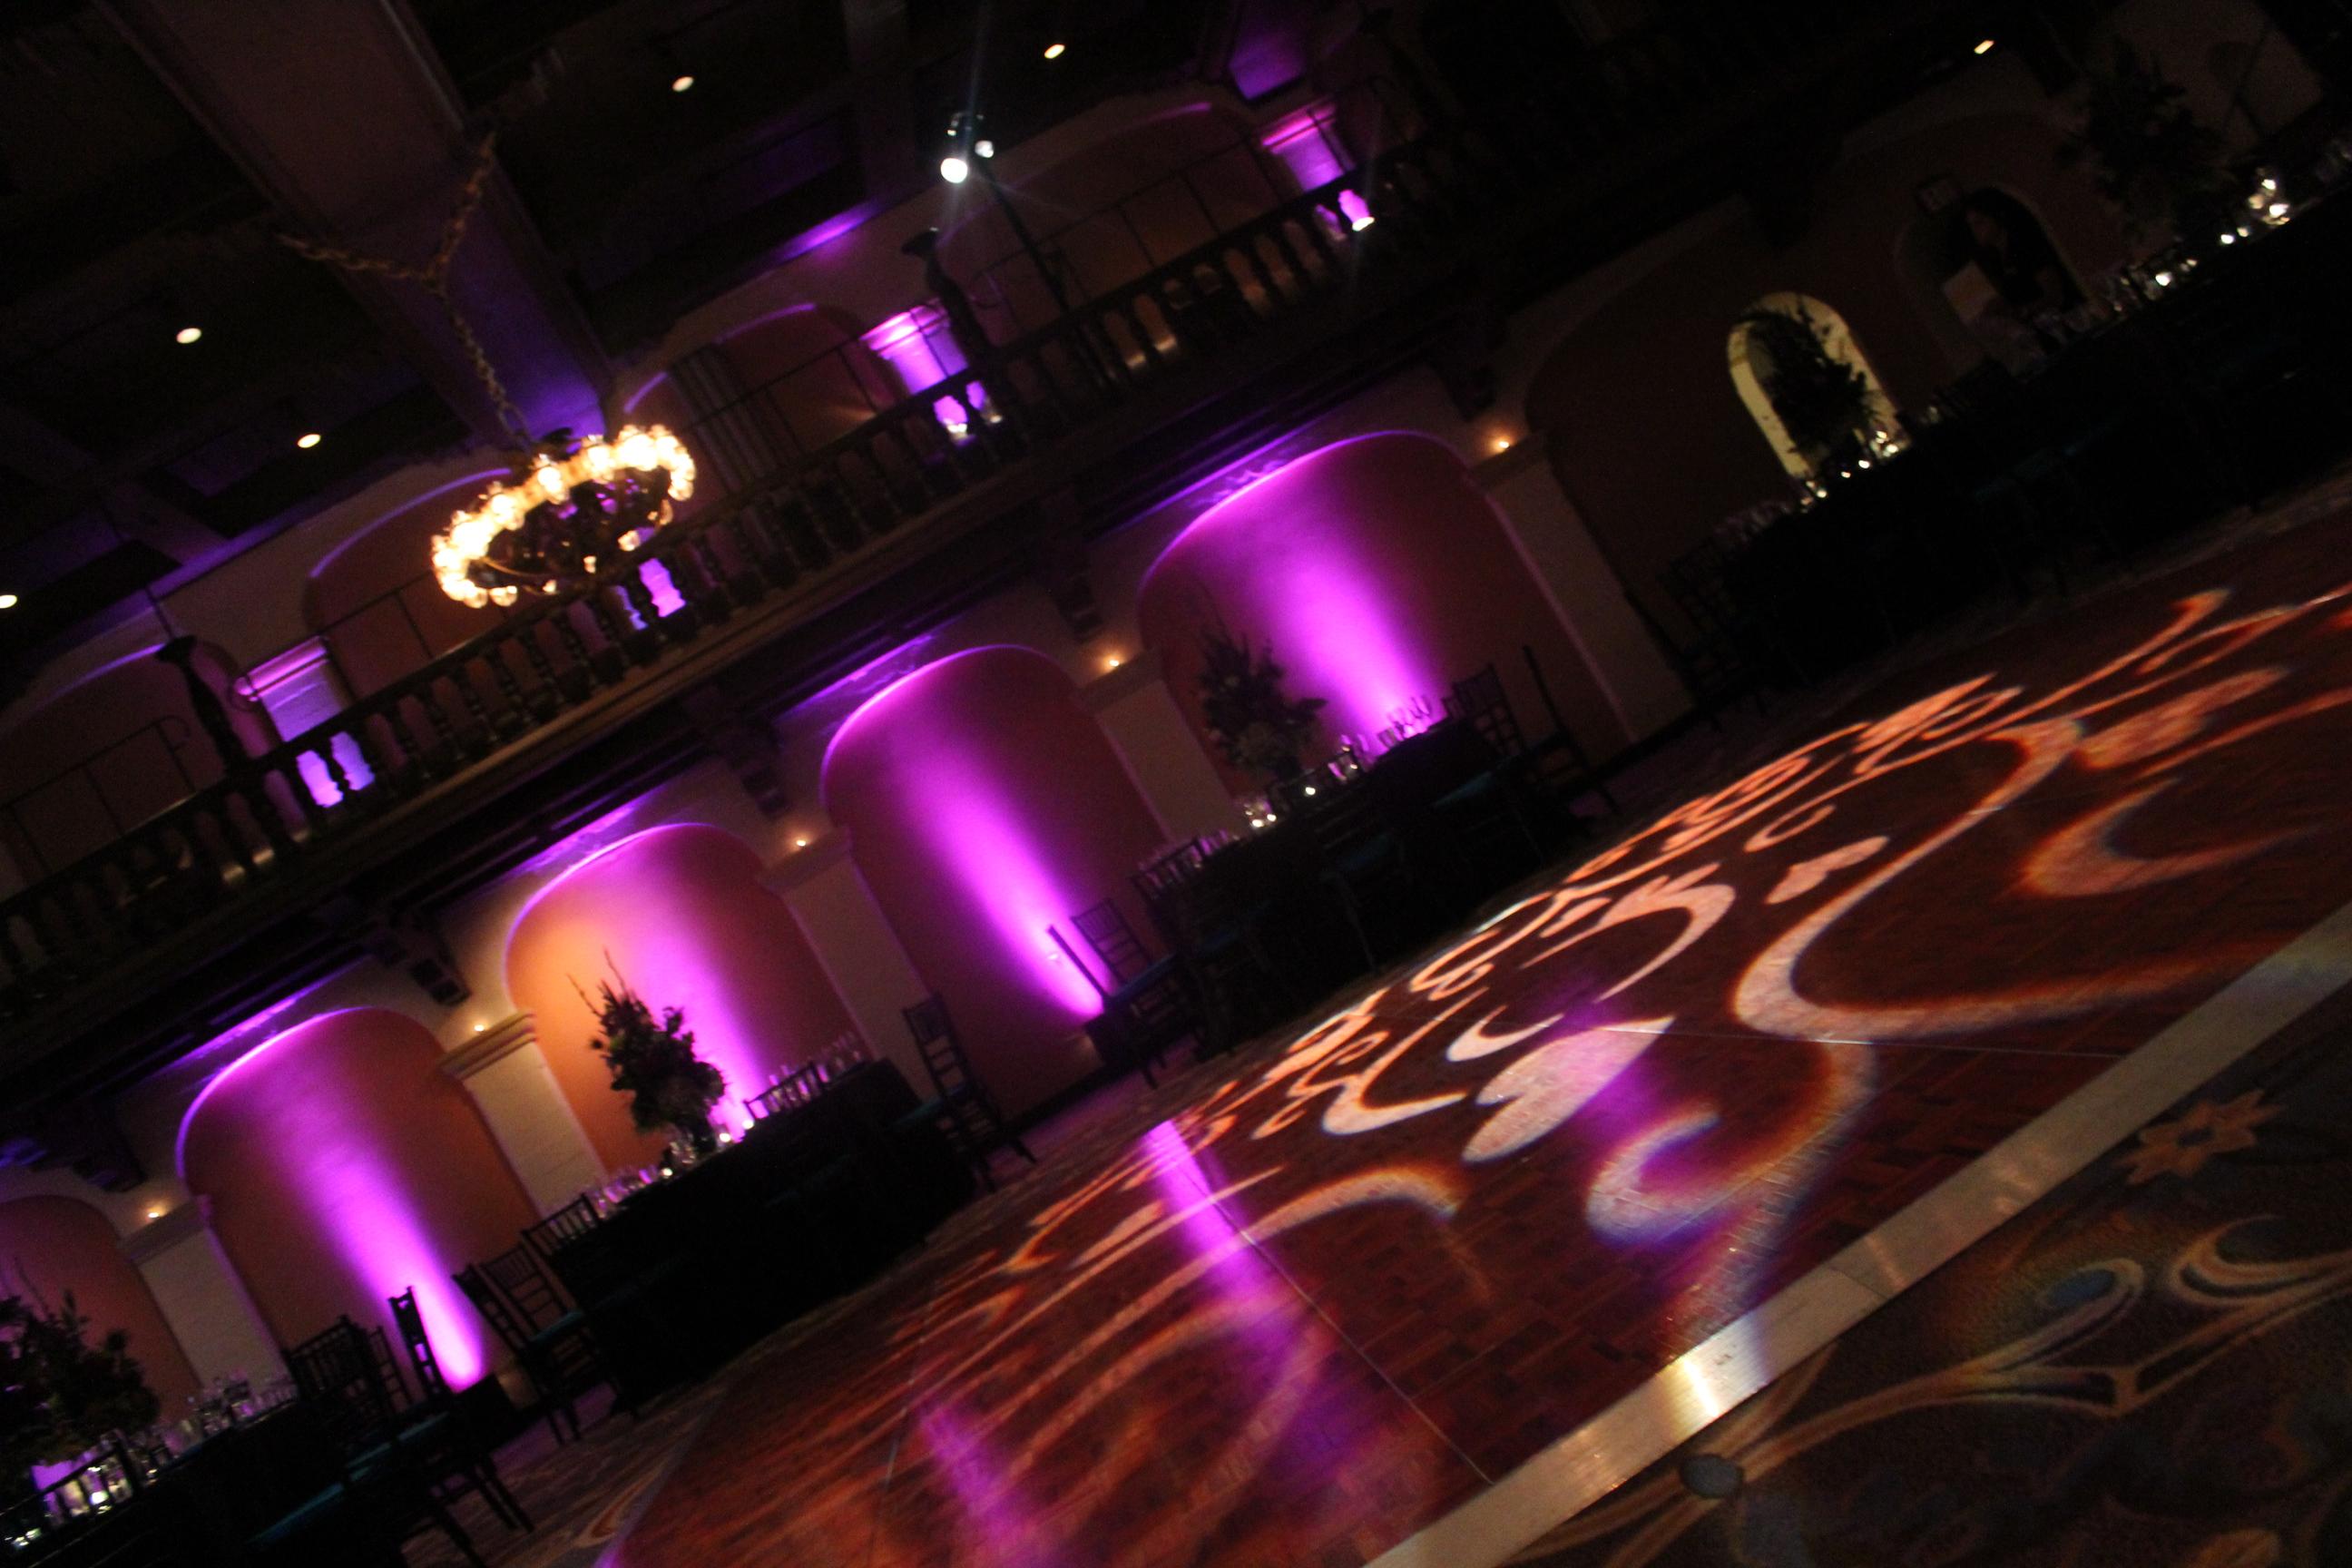 uplighting and floor monogram lighting